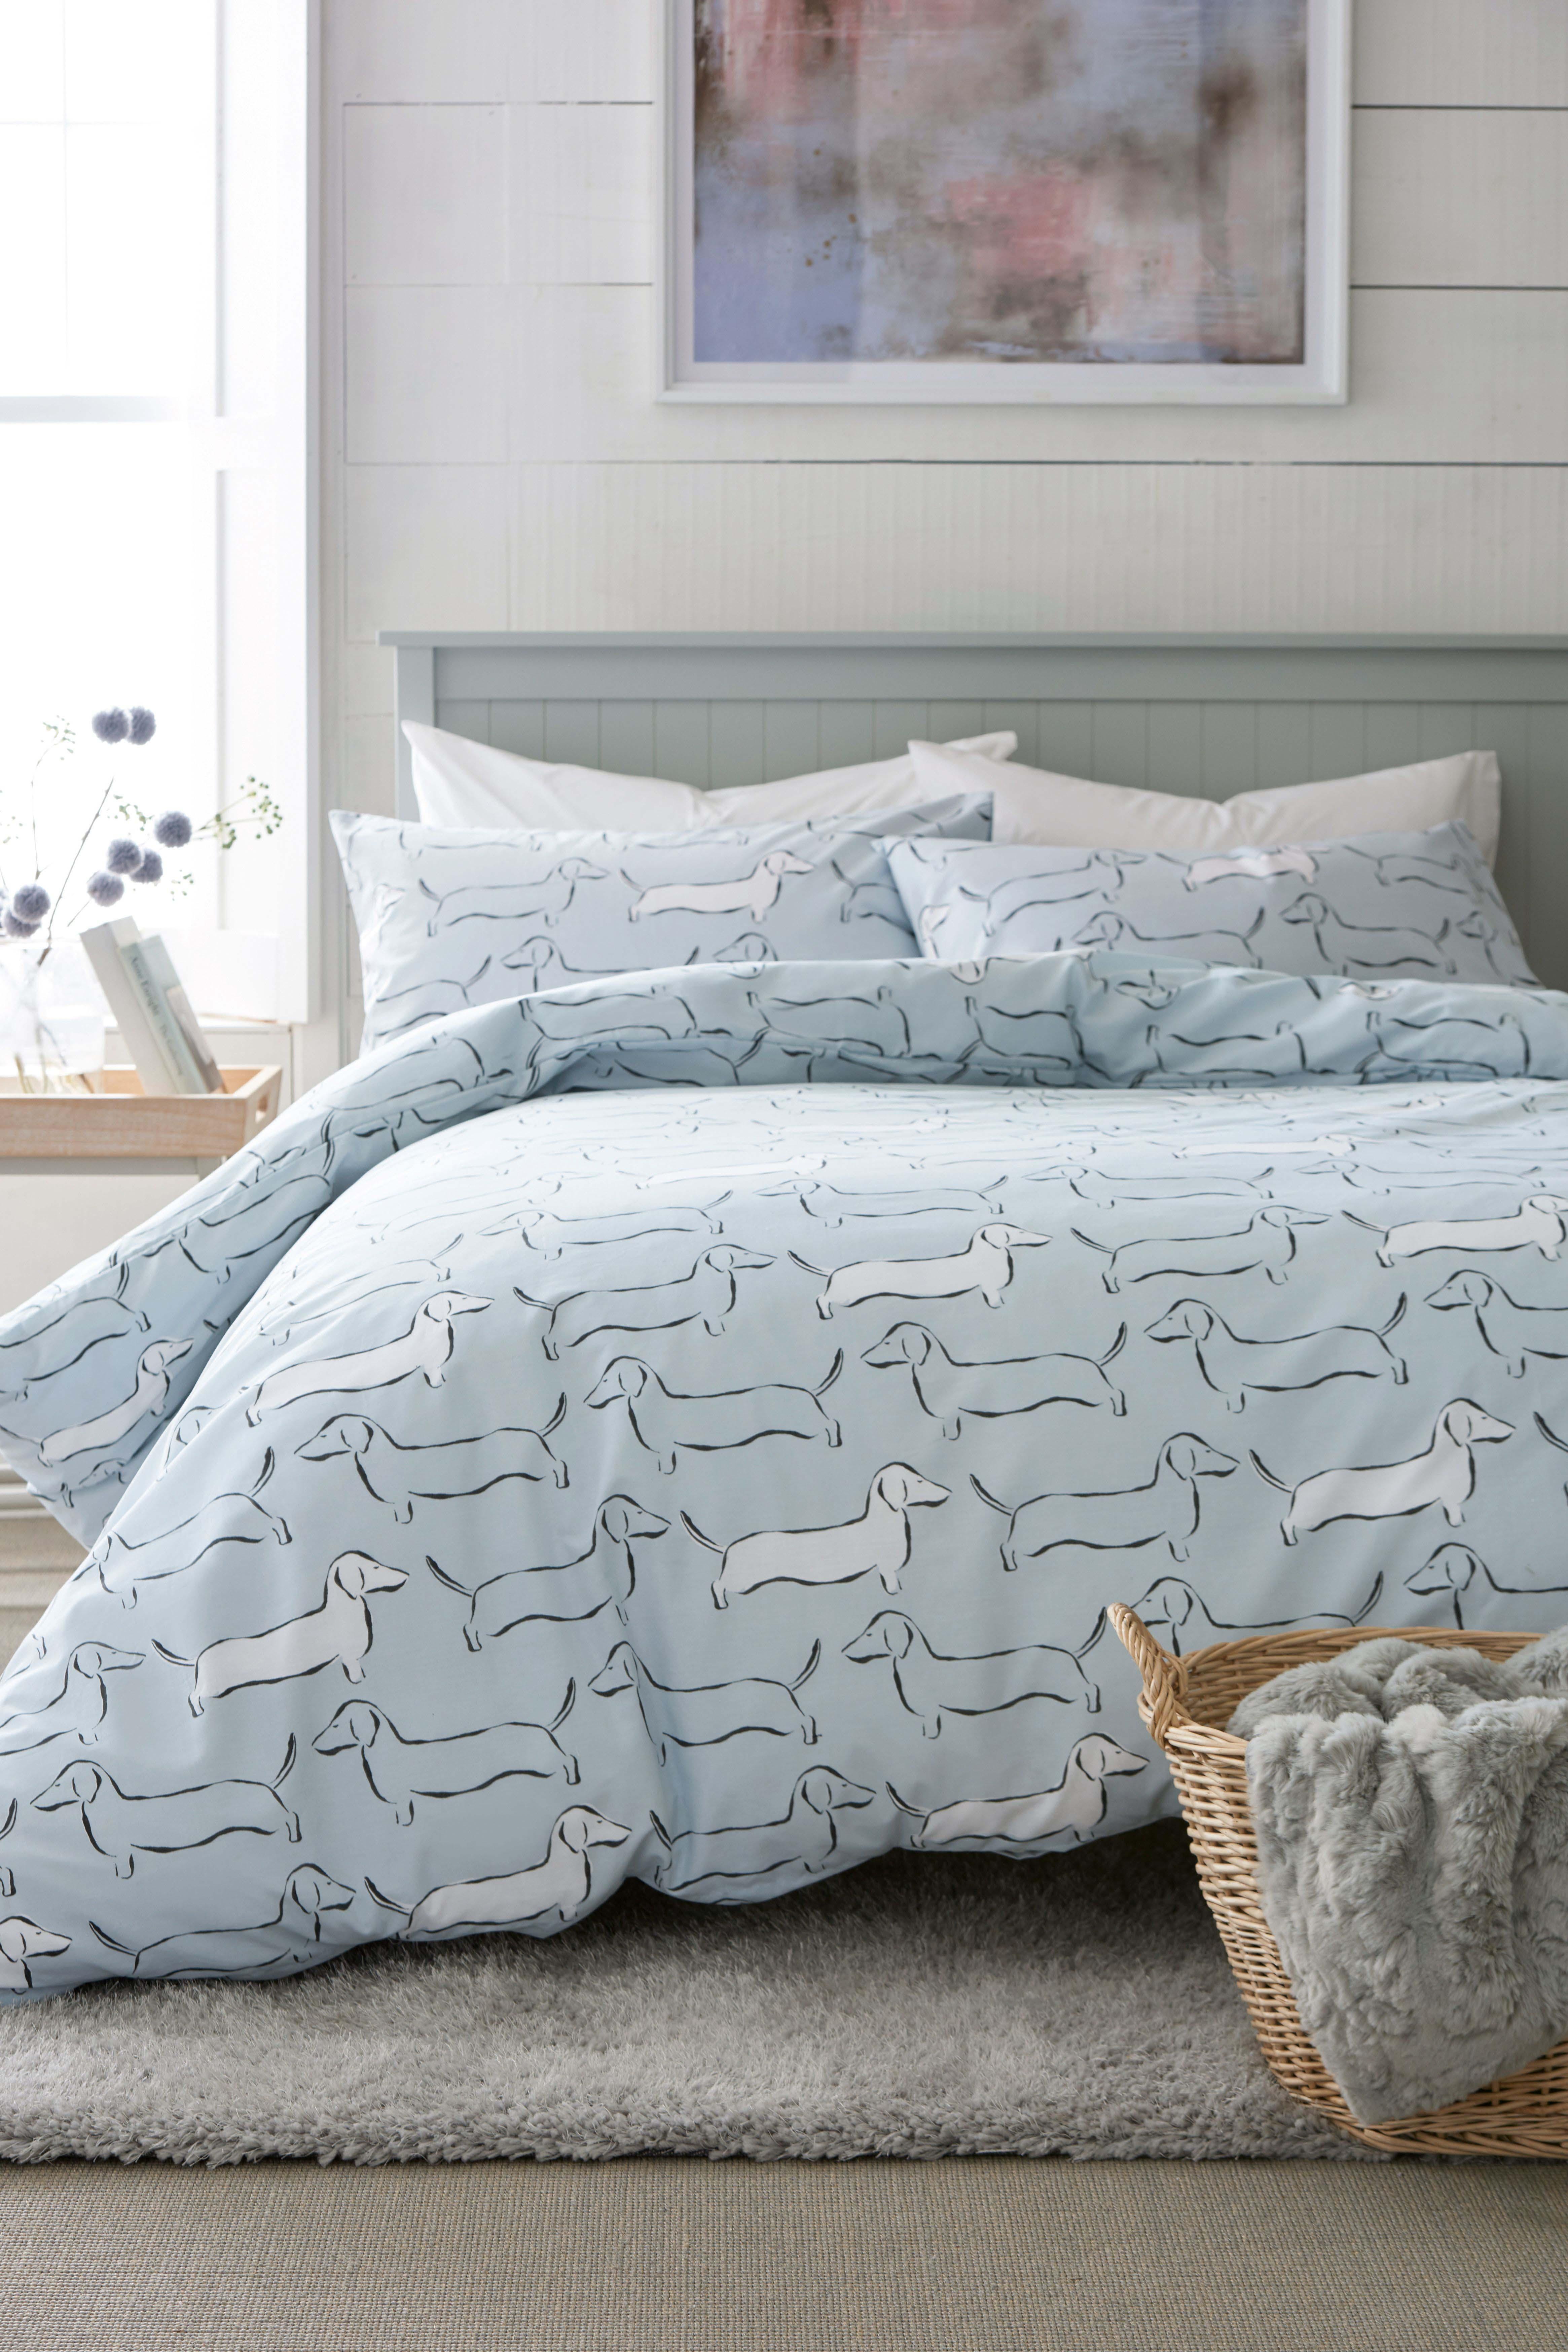 Next Dachshund Bed Set Blue Bed Linens Luxury Bedding Sets